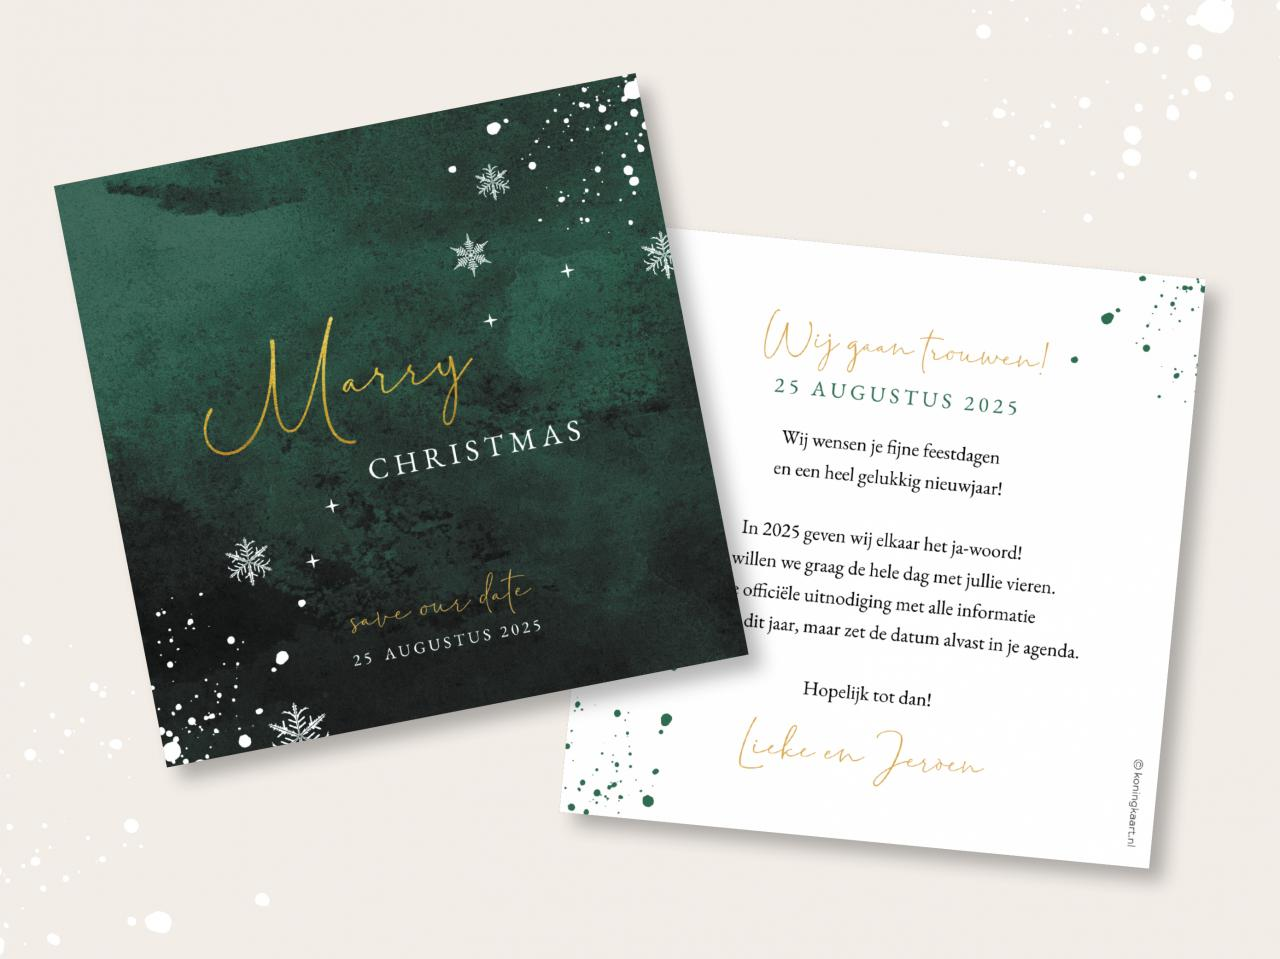 Kerst save the date kaart met donkergroene waterverf trouwkaart Stijlvol Origineel Aquarel en Watercolor Save the Date